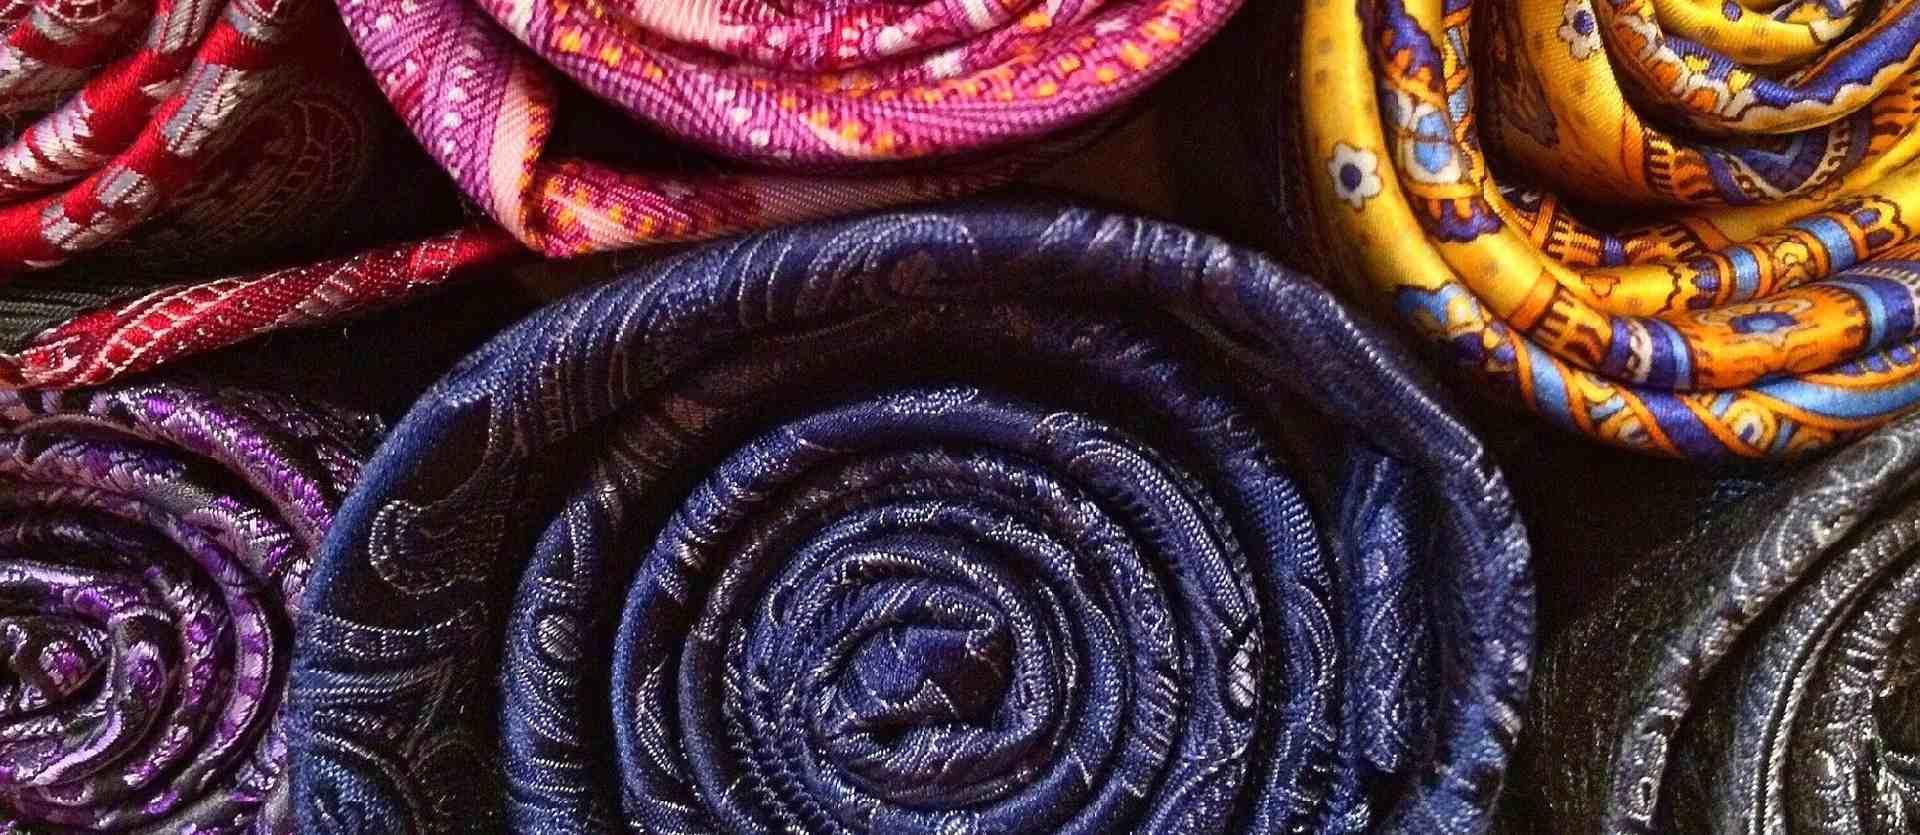 EUROTEX – Rumen Petrov Ltd. importer of fabrics from Italy